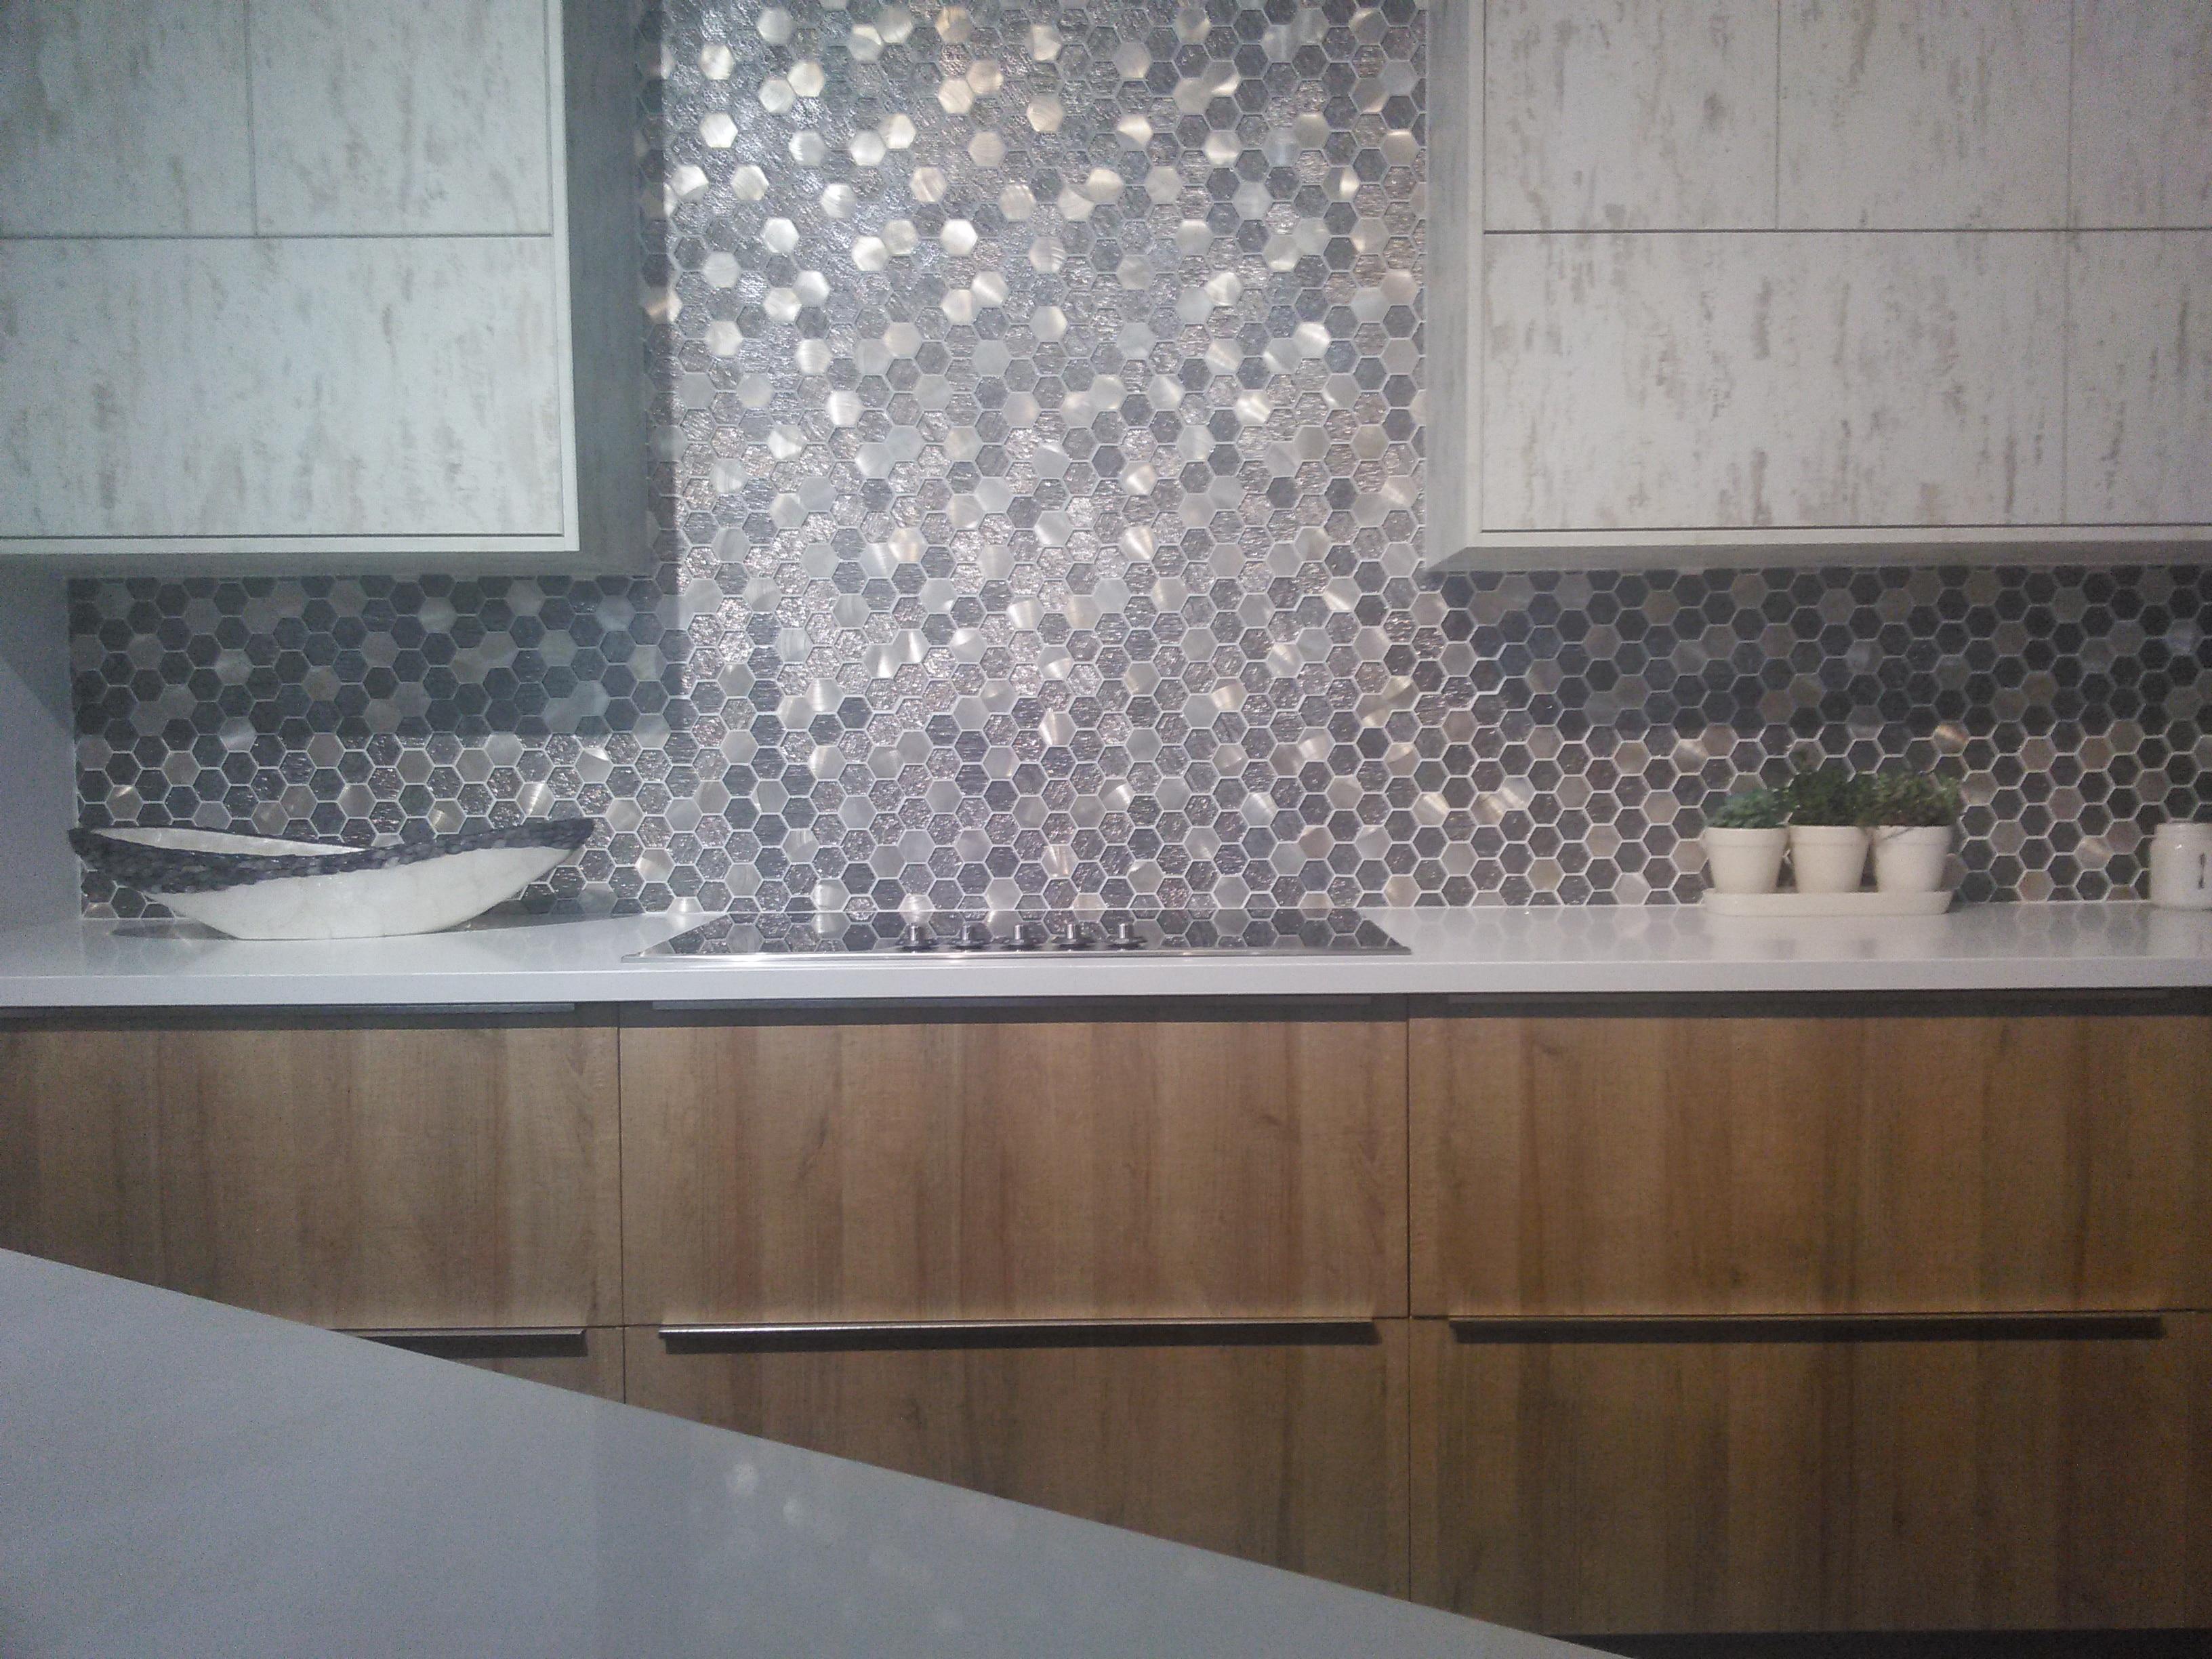 Kitchen Backsplash Ideas for Flat European Cabinets ...